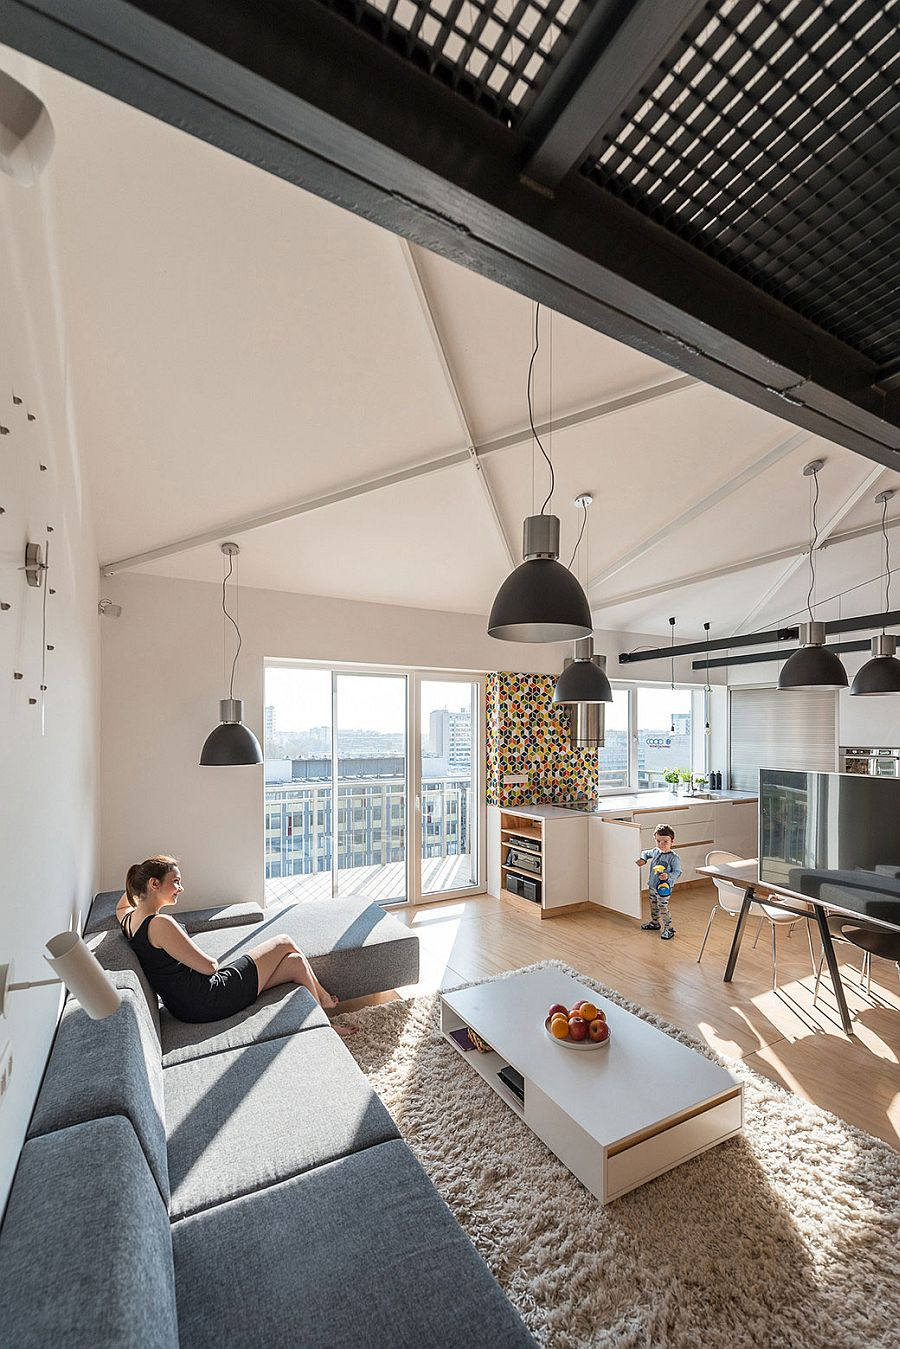 Modern Industrial Loft Apartment in Bratislava Showcases Space ...